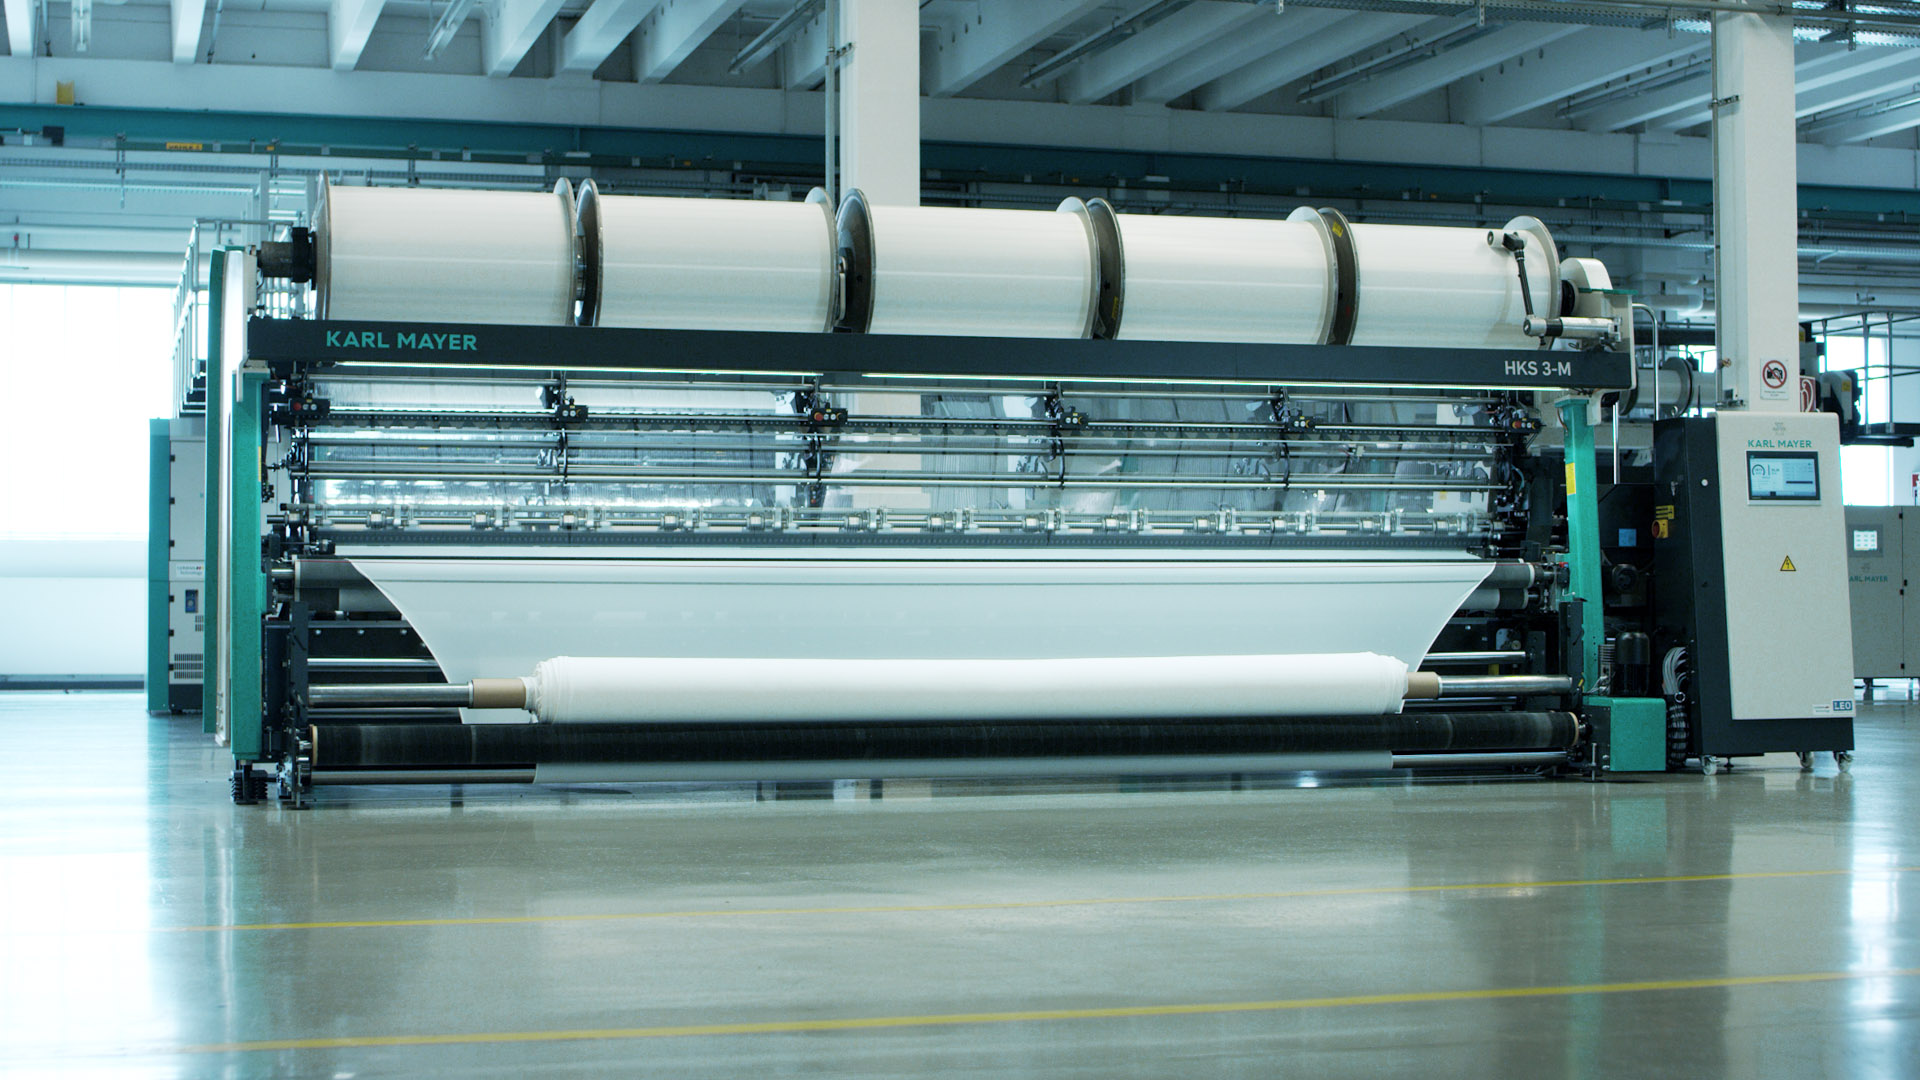 Karl-Mayer-Texture-Machine-Production-Textile_15.jpg